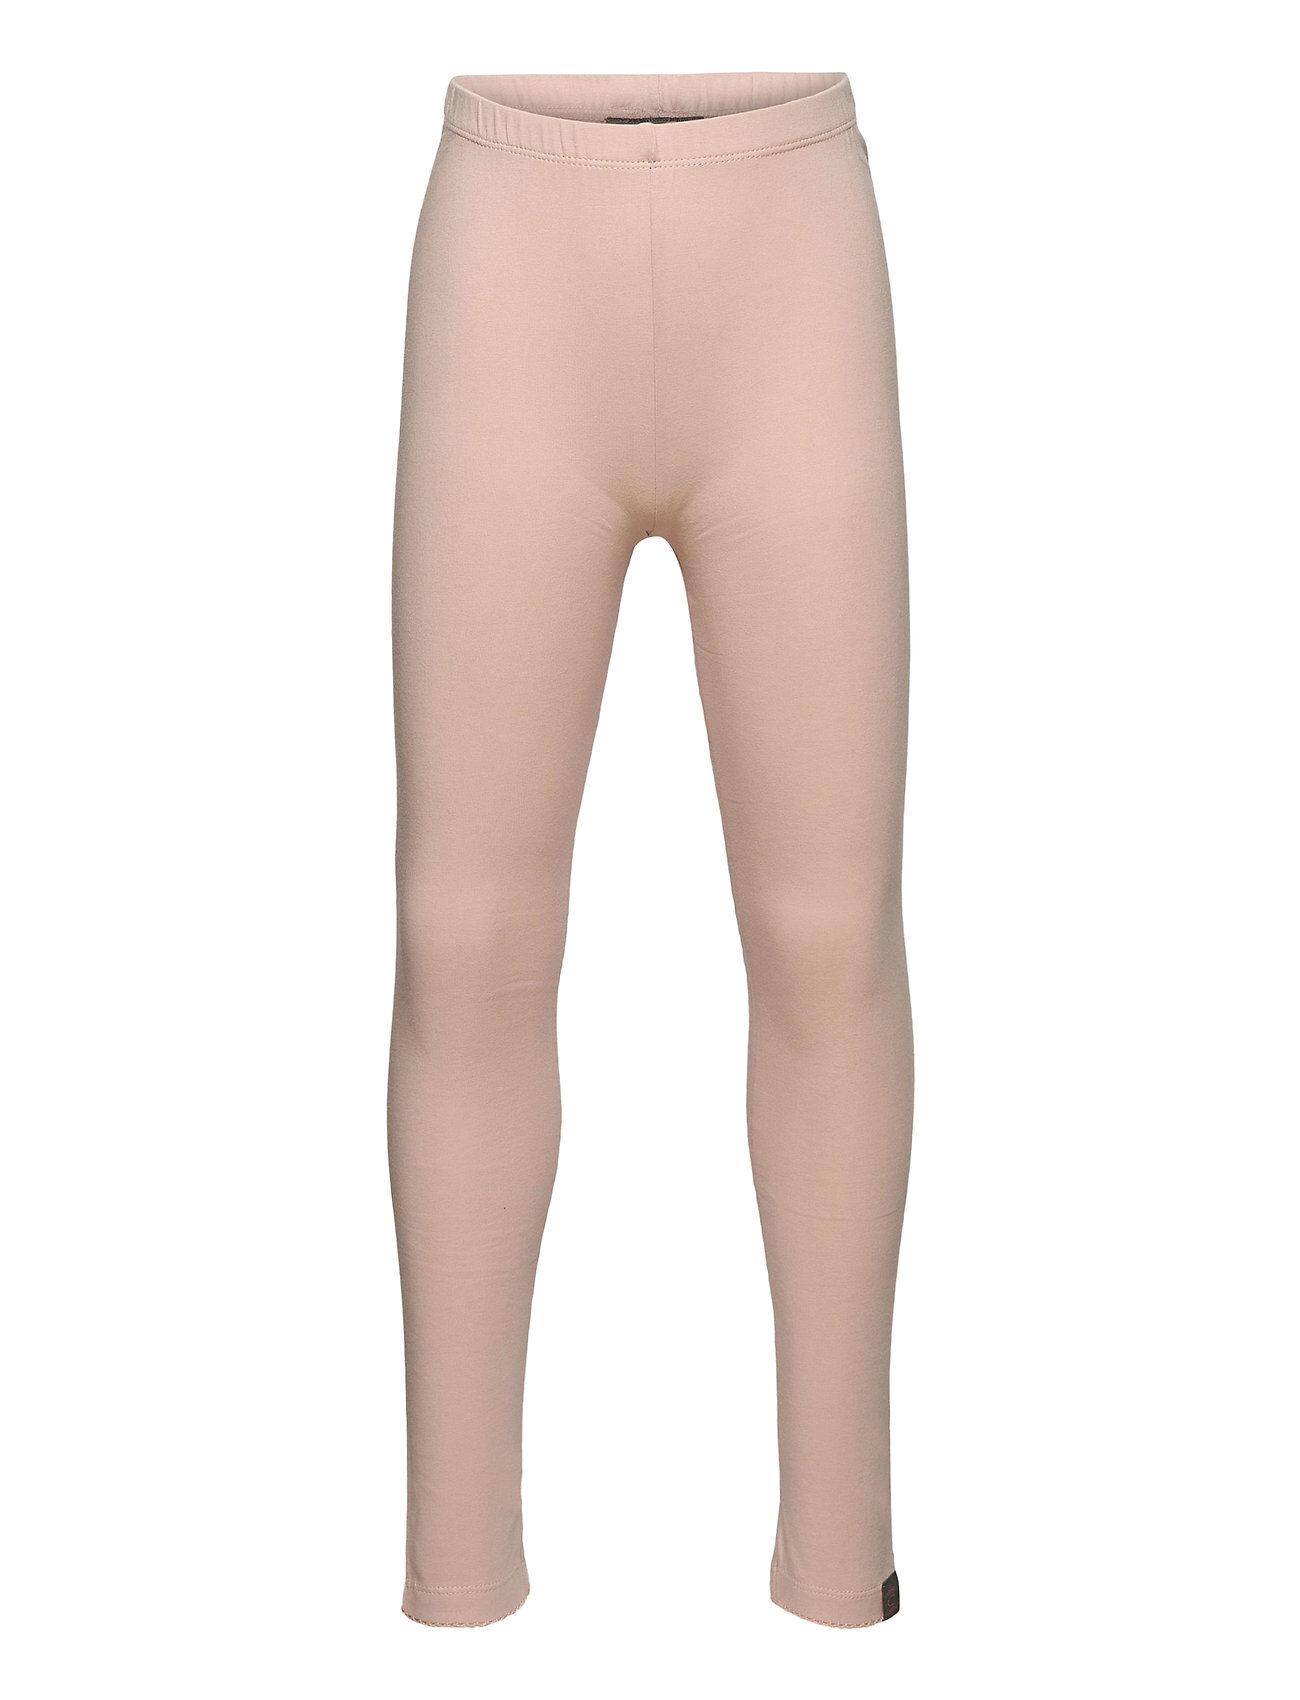 Creamie Leggings Leggingsit Vaaleanpunainen Creamie